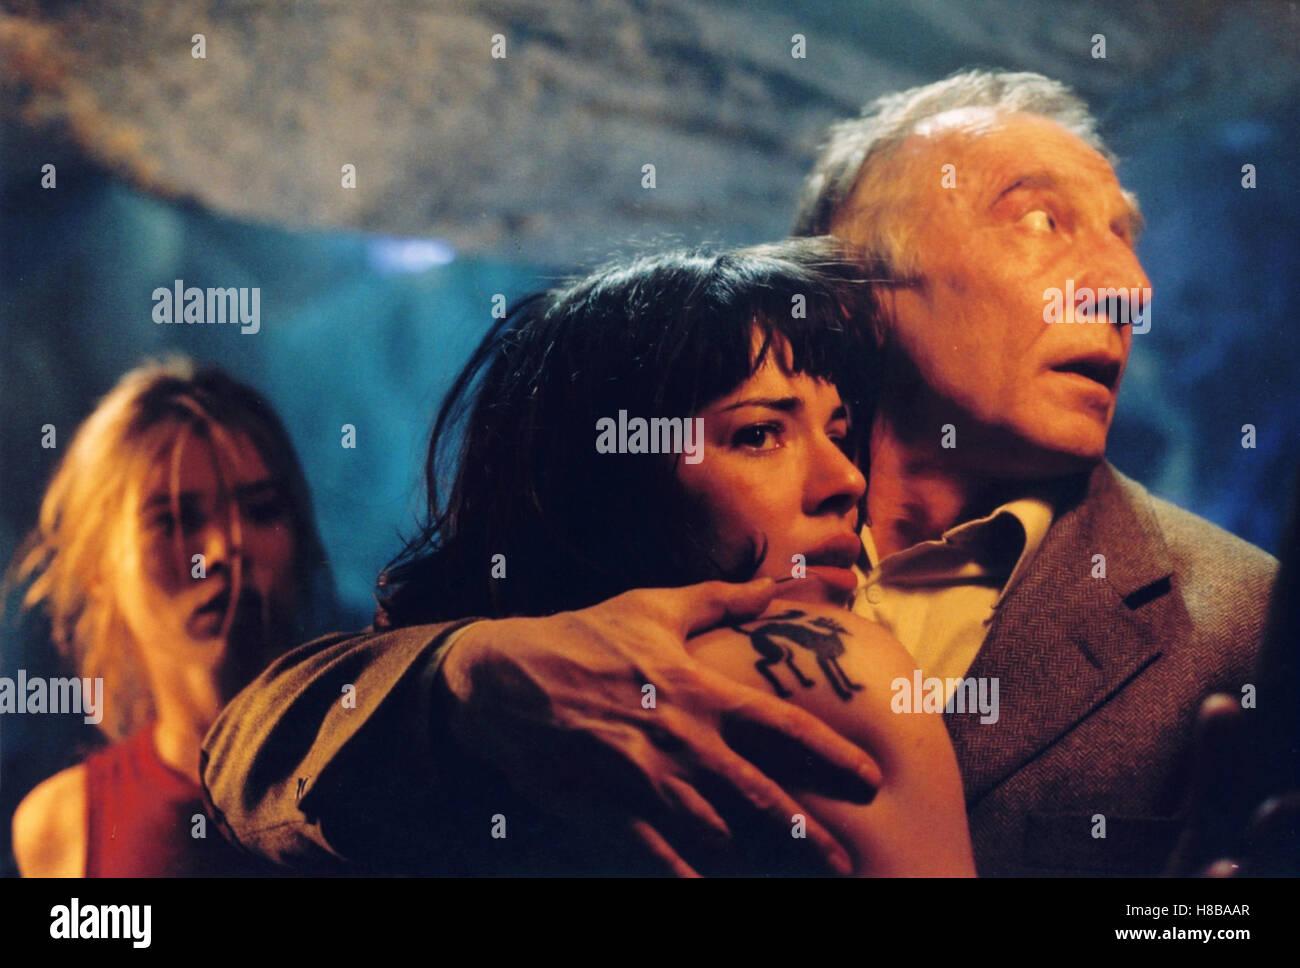 Pakt der Druiden, (BROCELIANDE) F 2002, Regie: Doug Headline, ELSA KIKOINE, CYLIA  MALKI, VERNON DOBTCHEFF, Key: Angst, Furcht, Grauen,